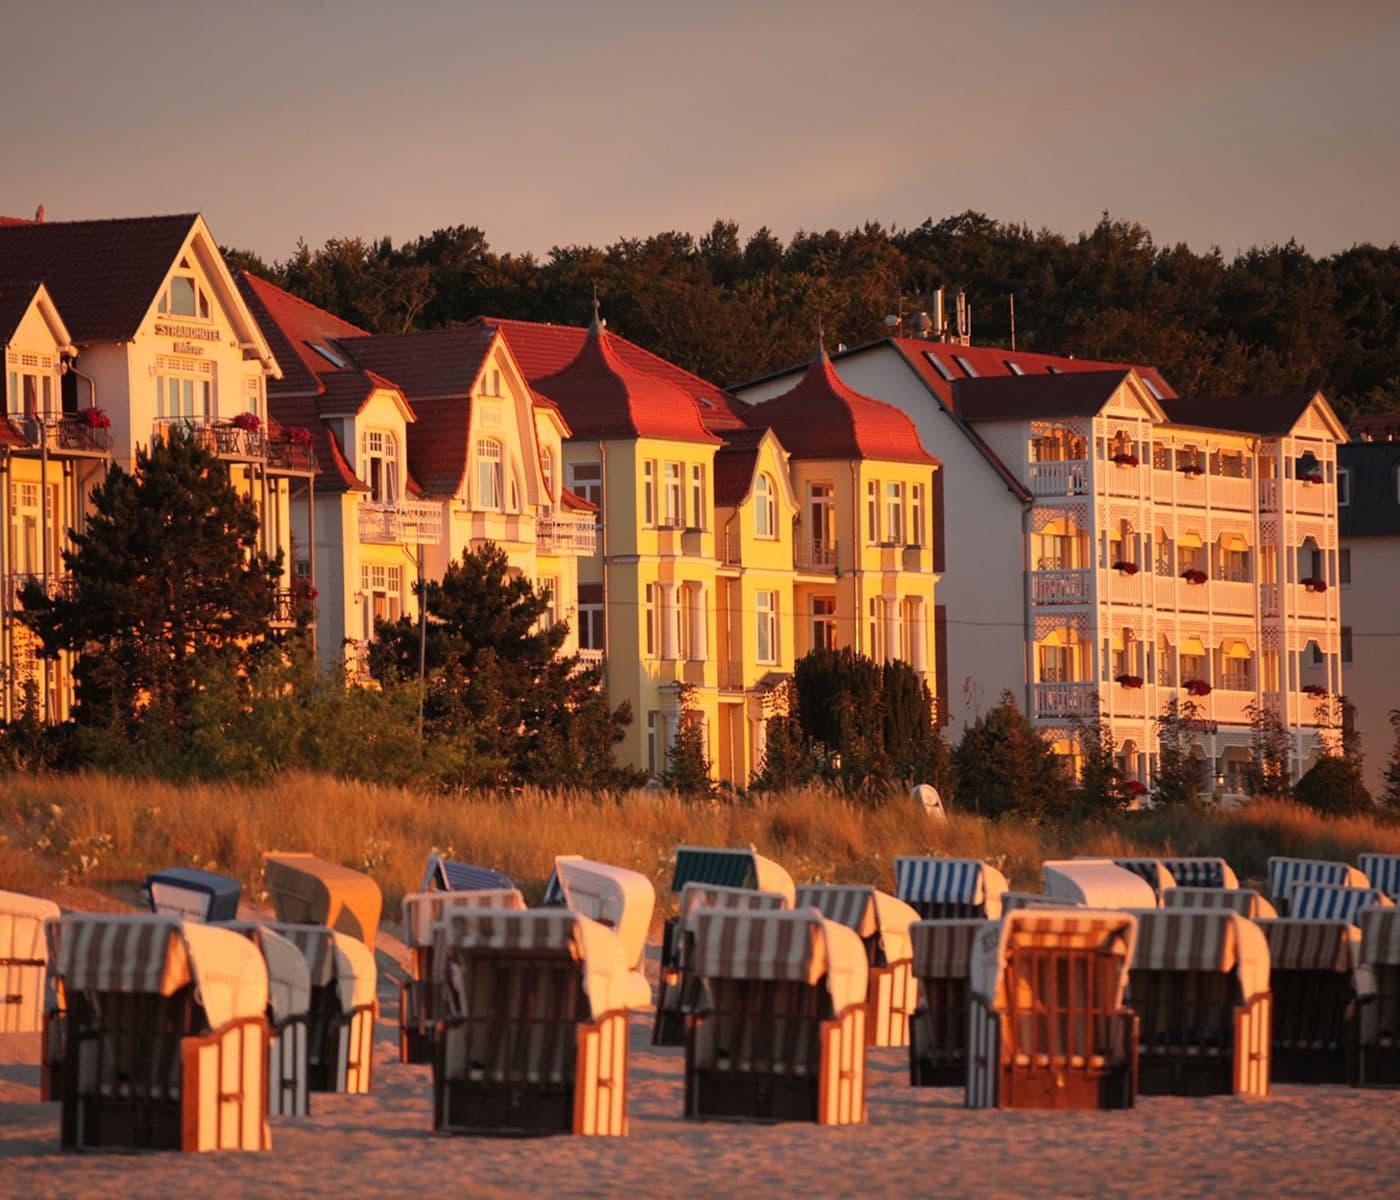 Abendsonne am Strand auf Usedom // HIMBEER